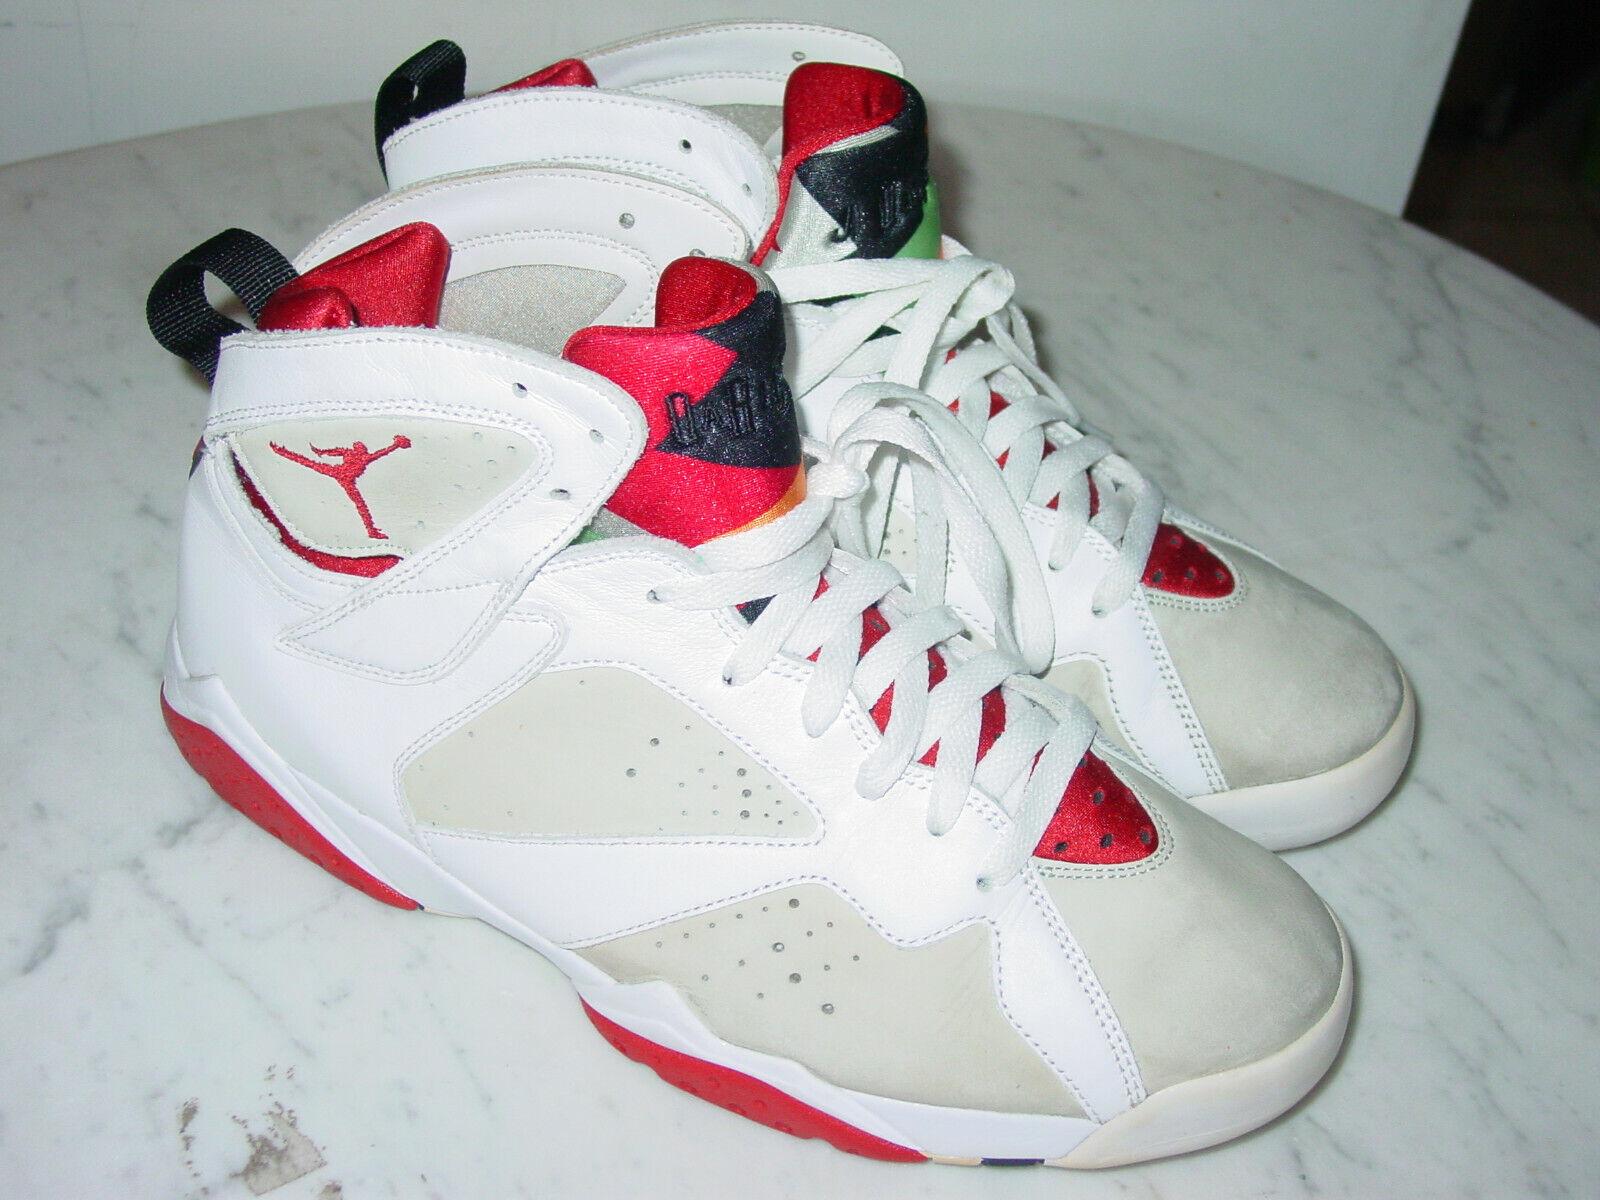 2014 Nike Air Jordan True Flight Southbeach White Basketball